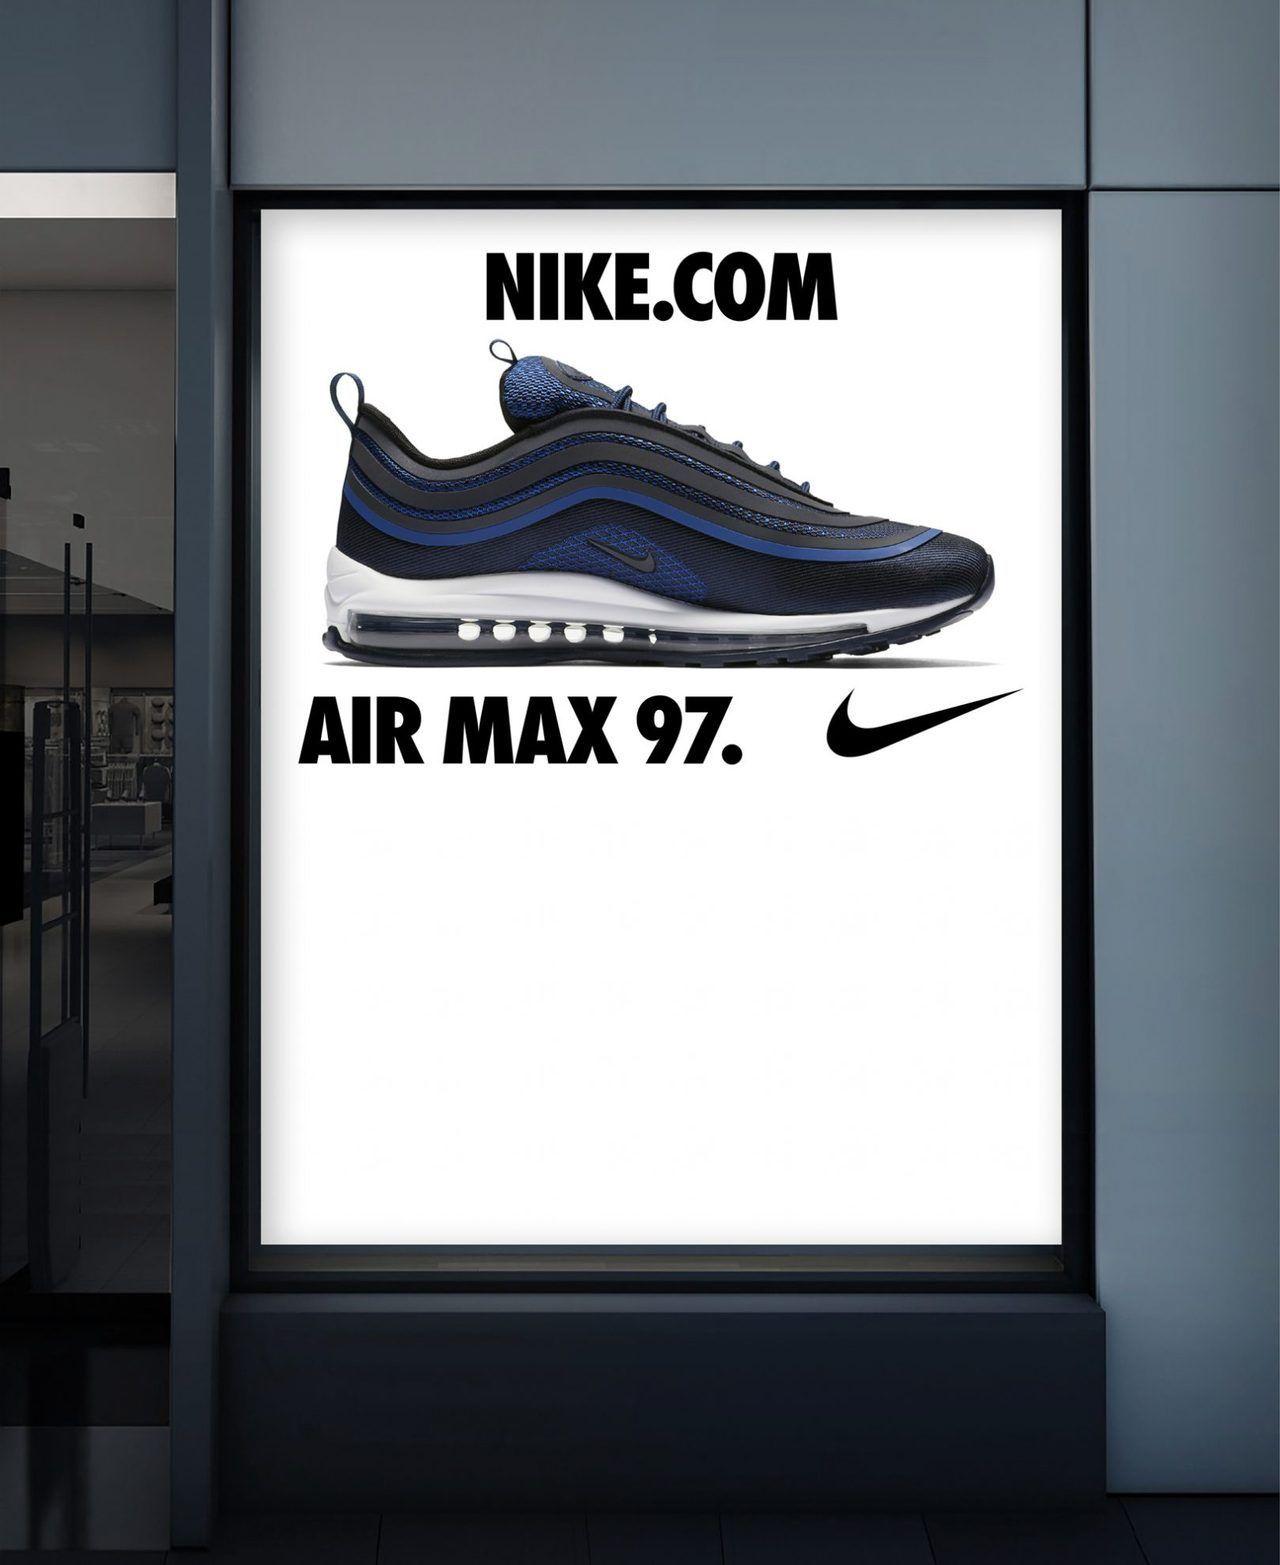 DESIGN EVERYWHERE Learning logo, Air max 97, Nike